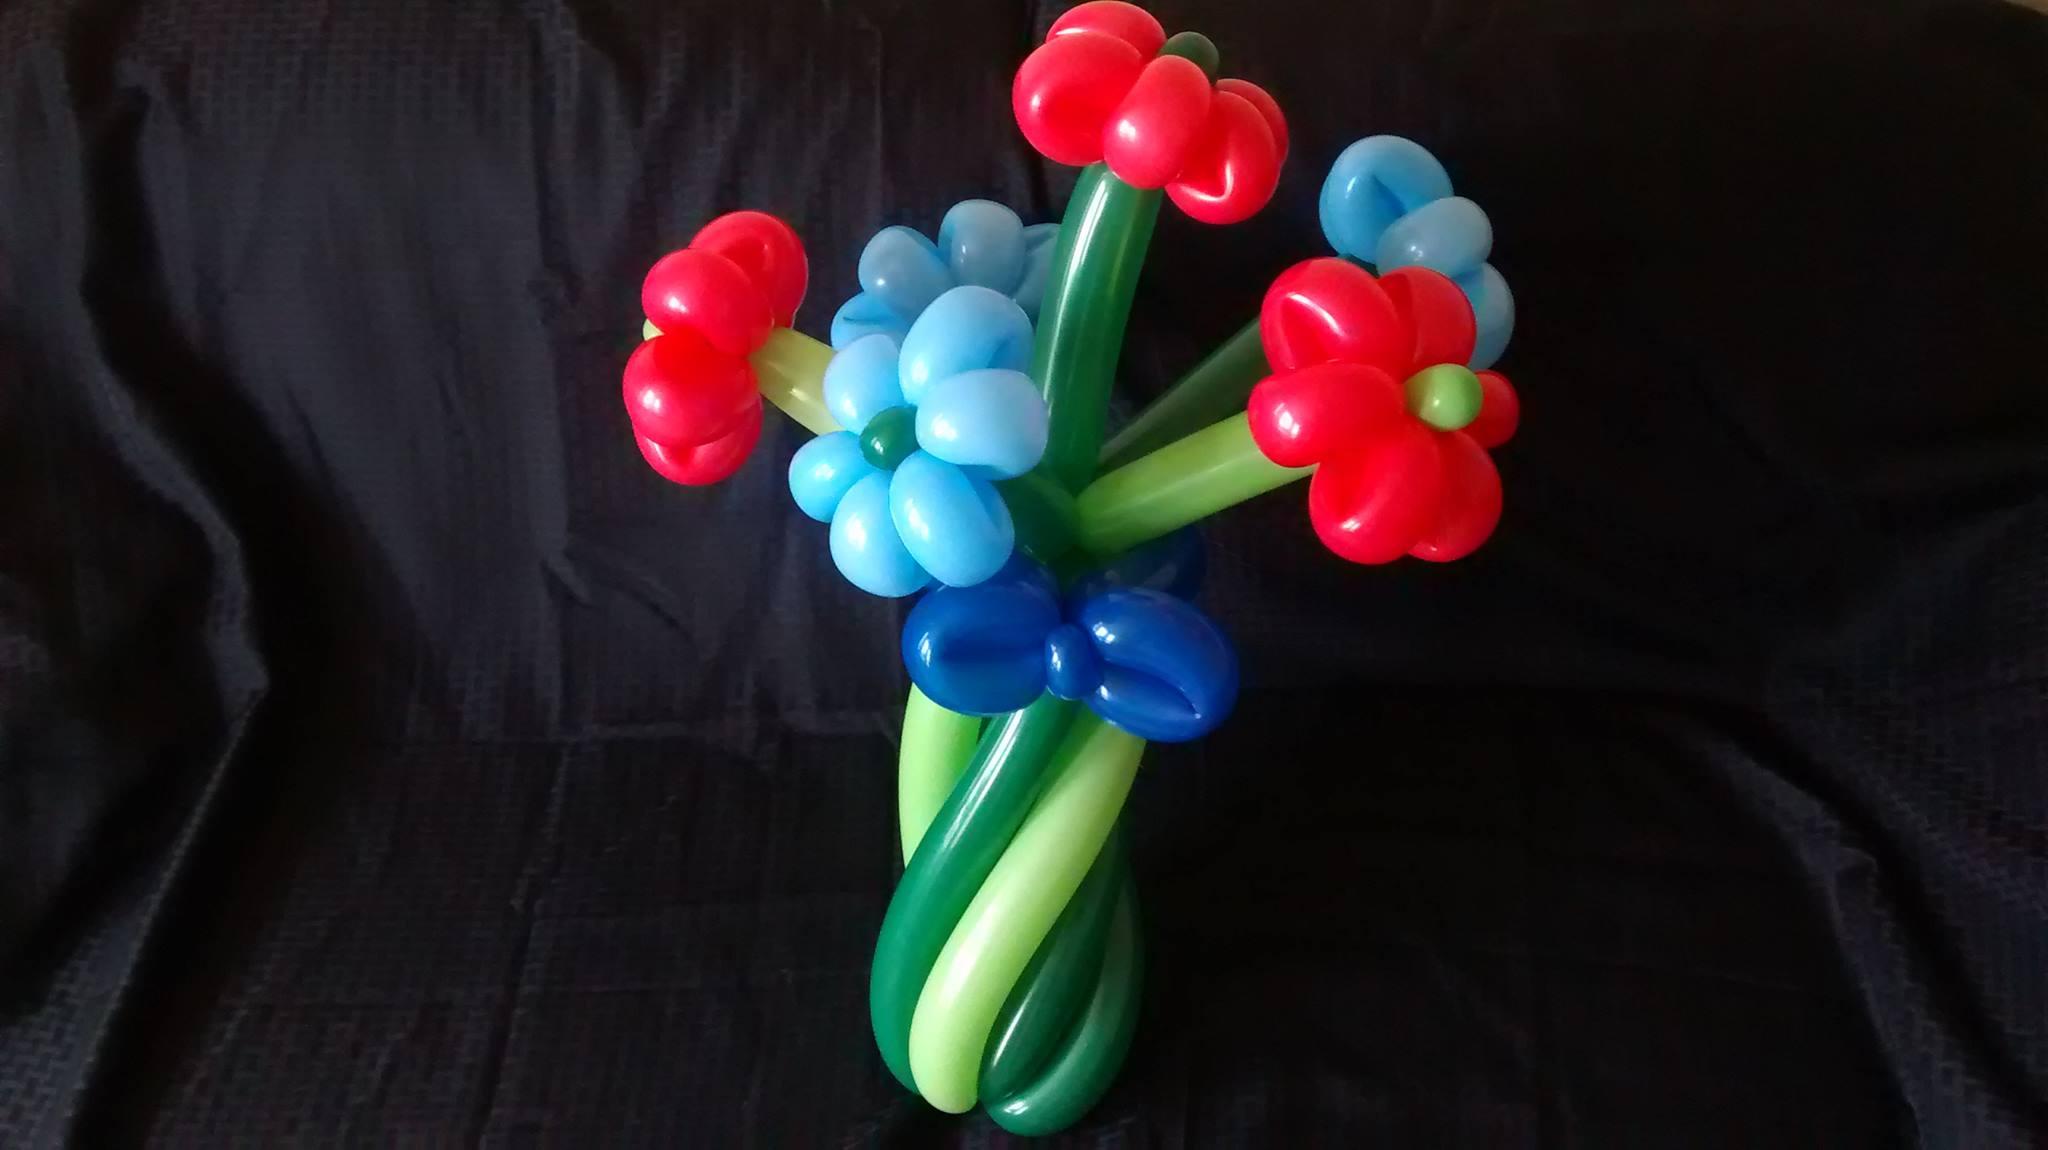 balloonflowers.jpg